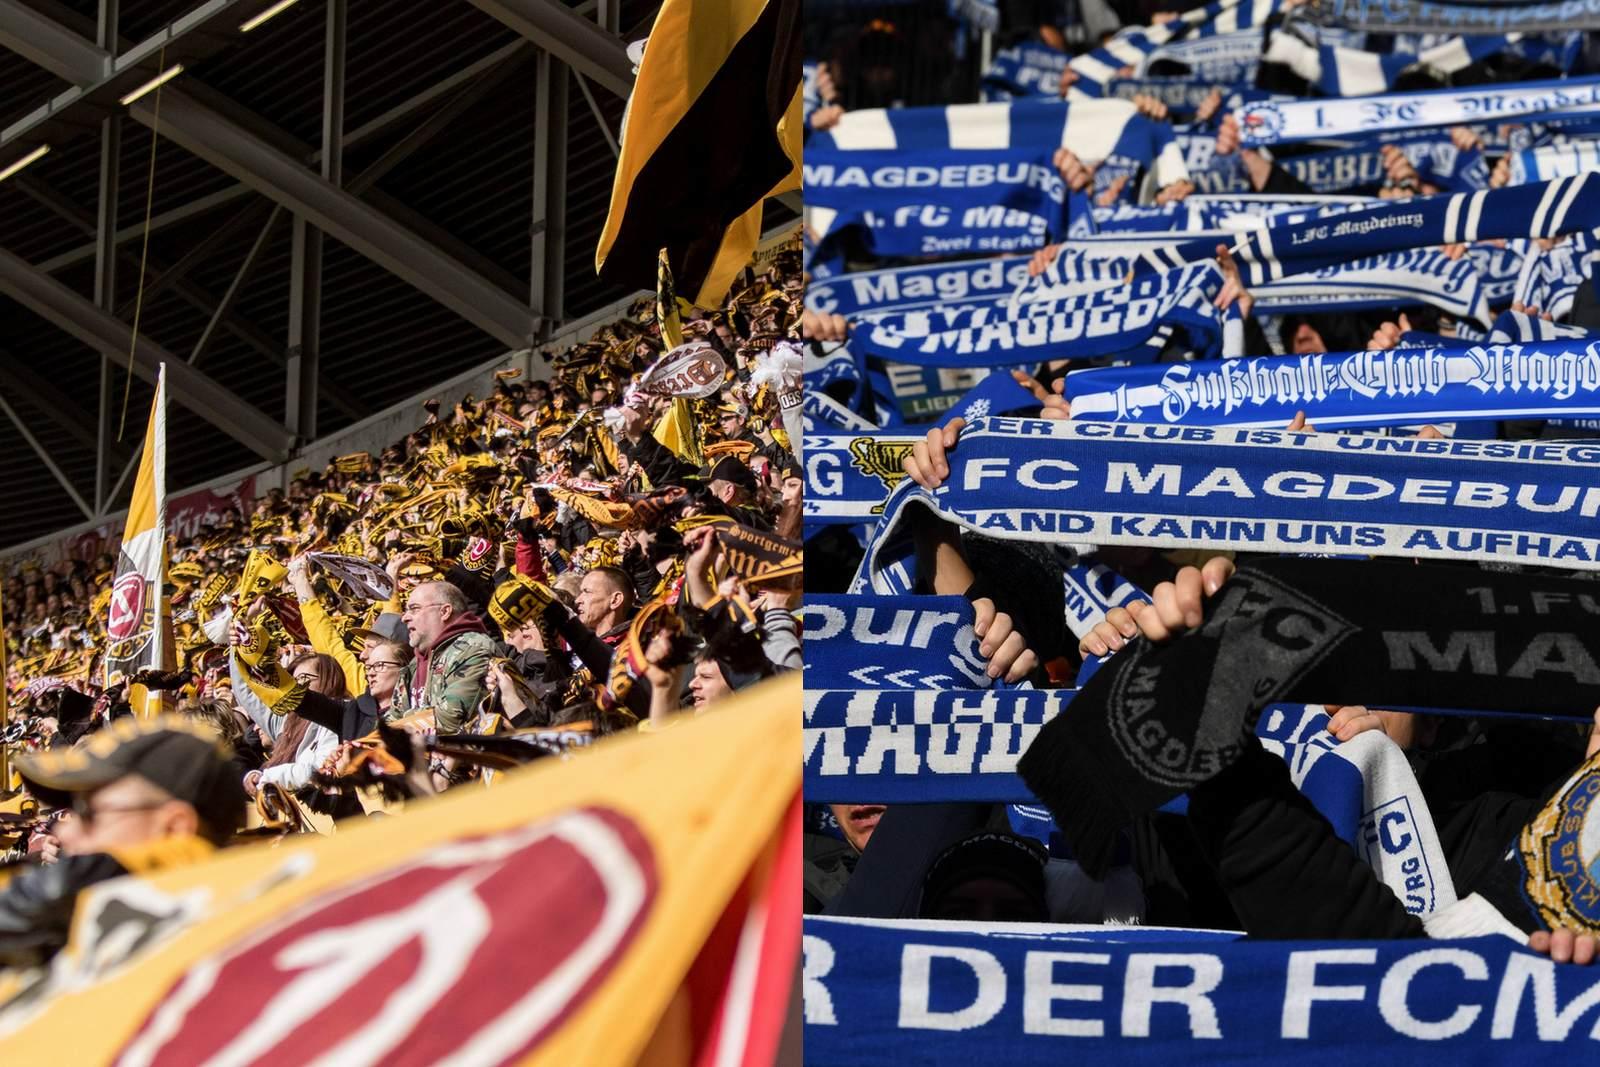 Im Stadion bei Dynamo Dresden bzw. dem 1. FC Magdeburg